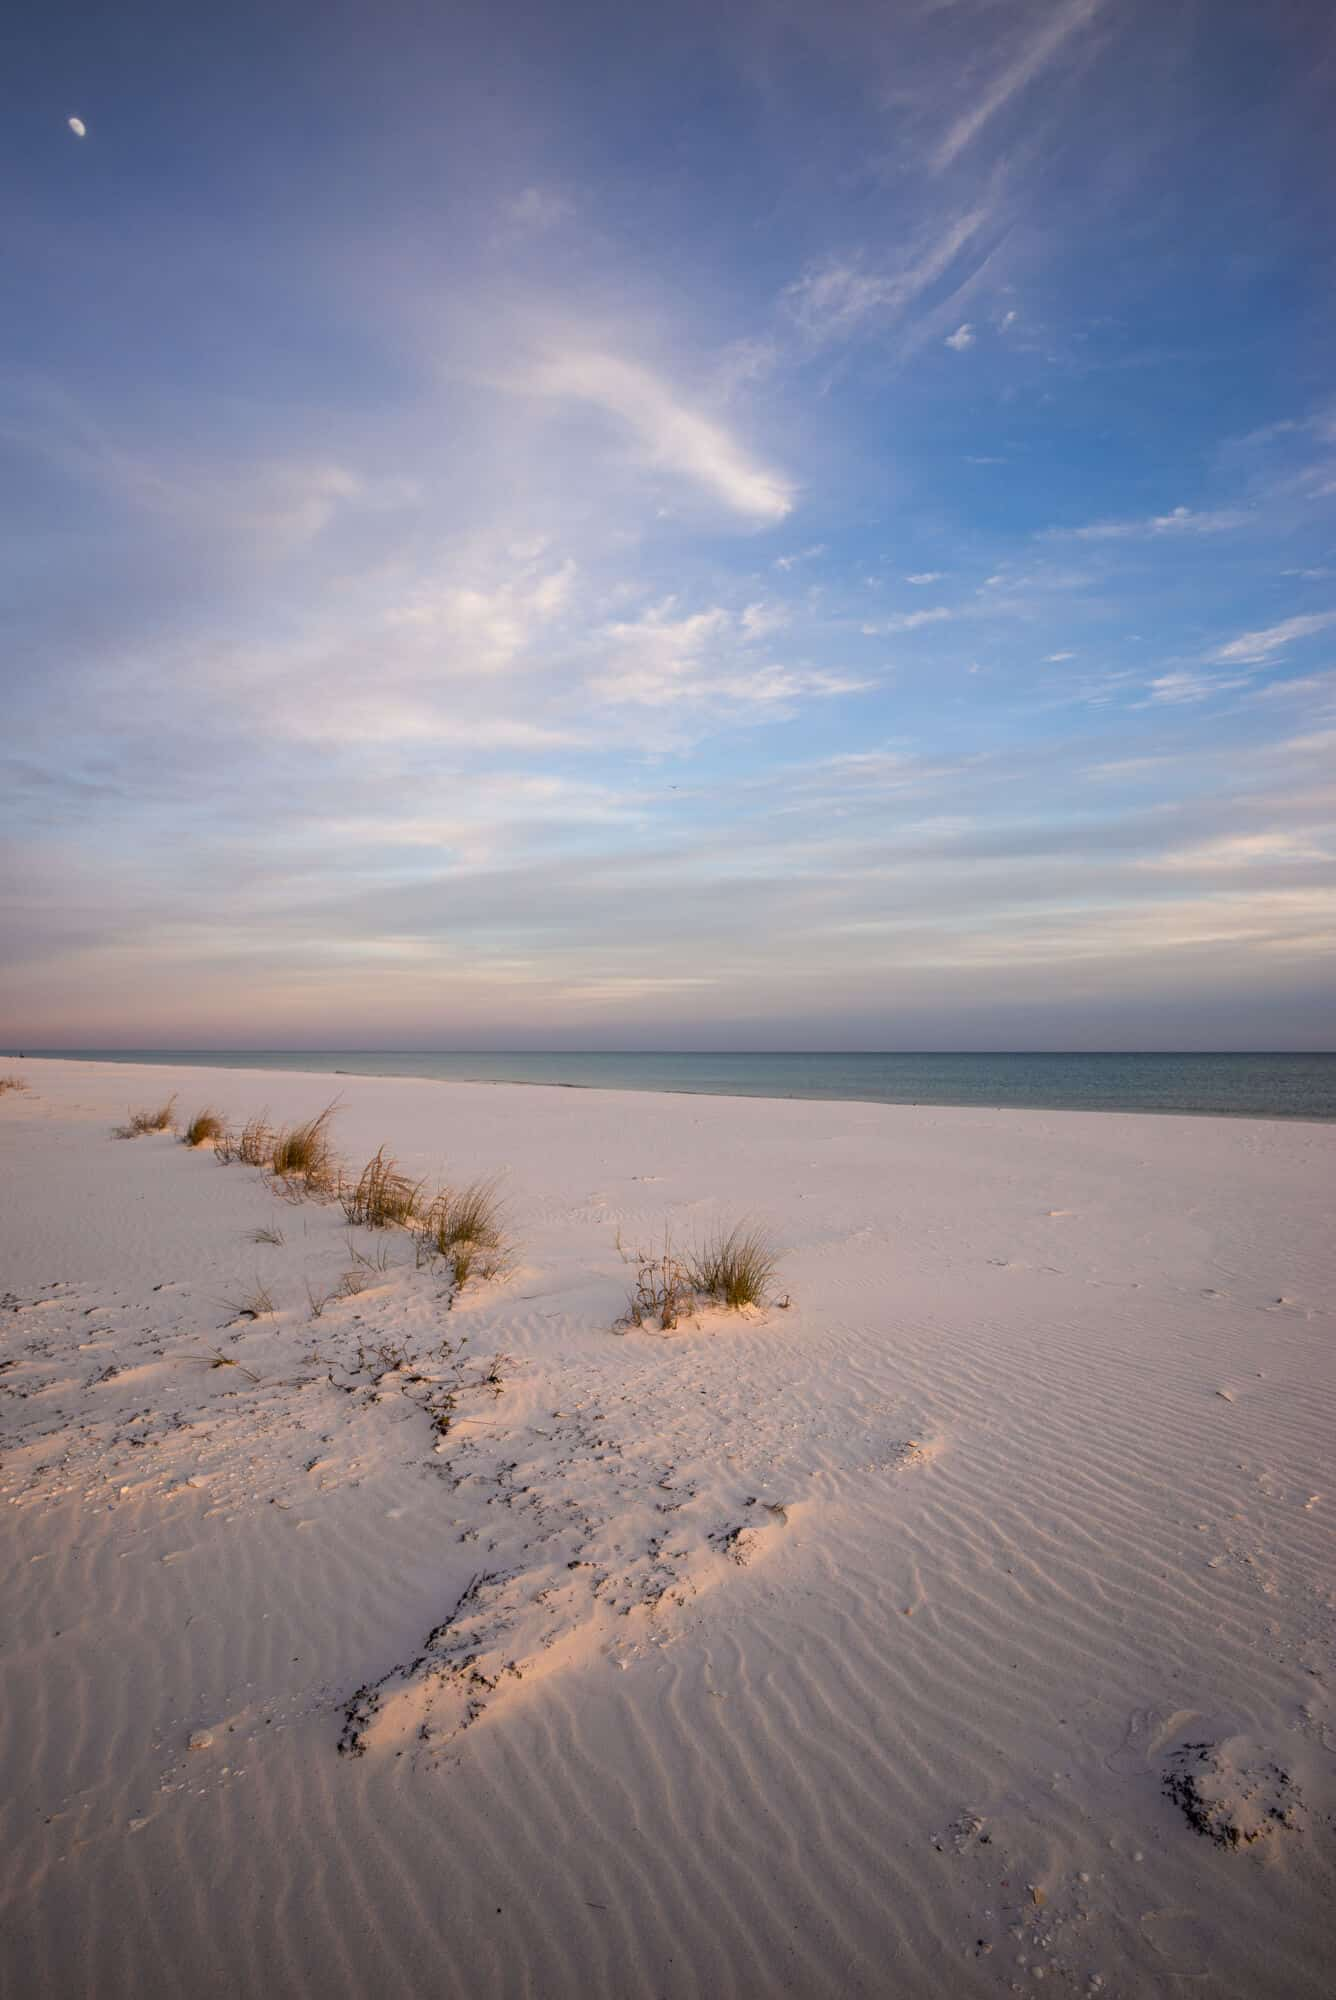 Gulf Breeze, FL